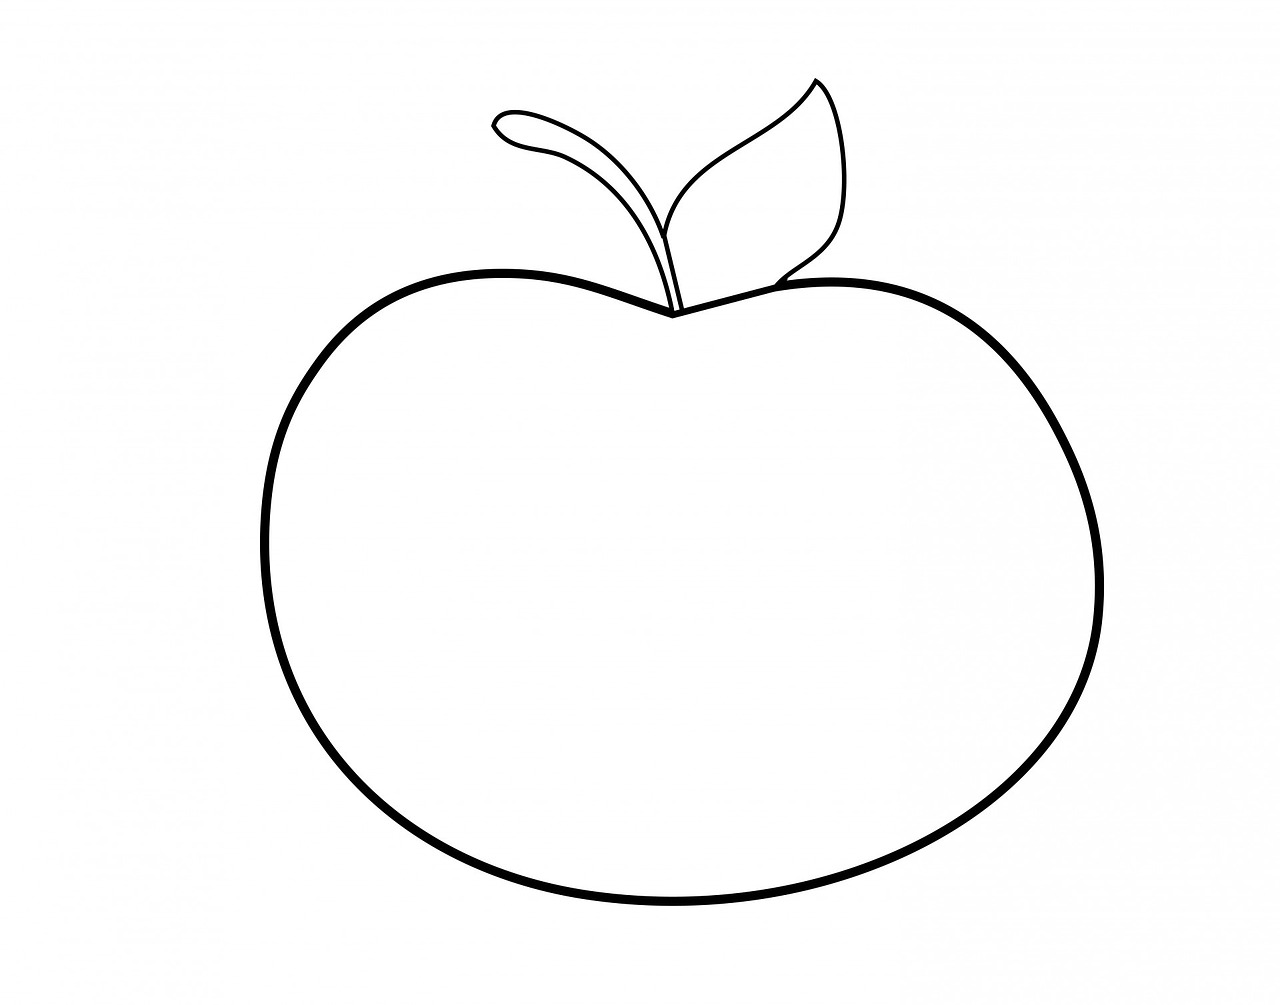 шаблон картинки яблоко этот раз все